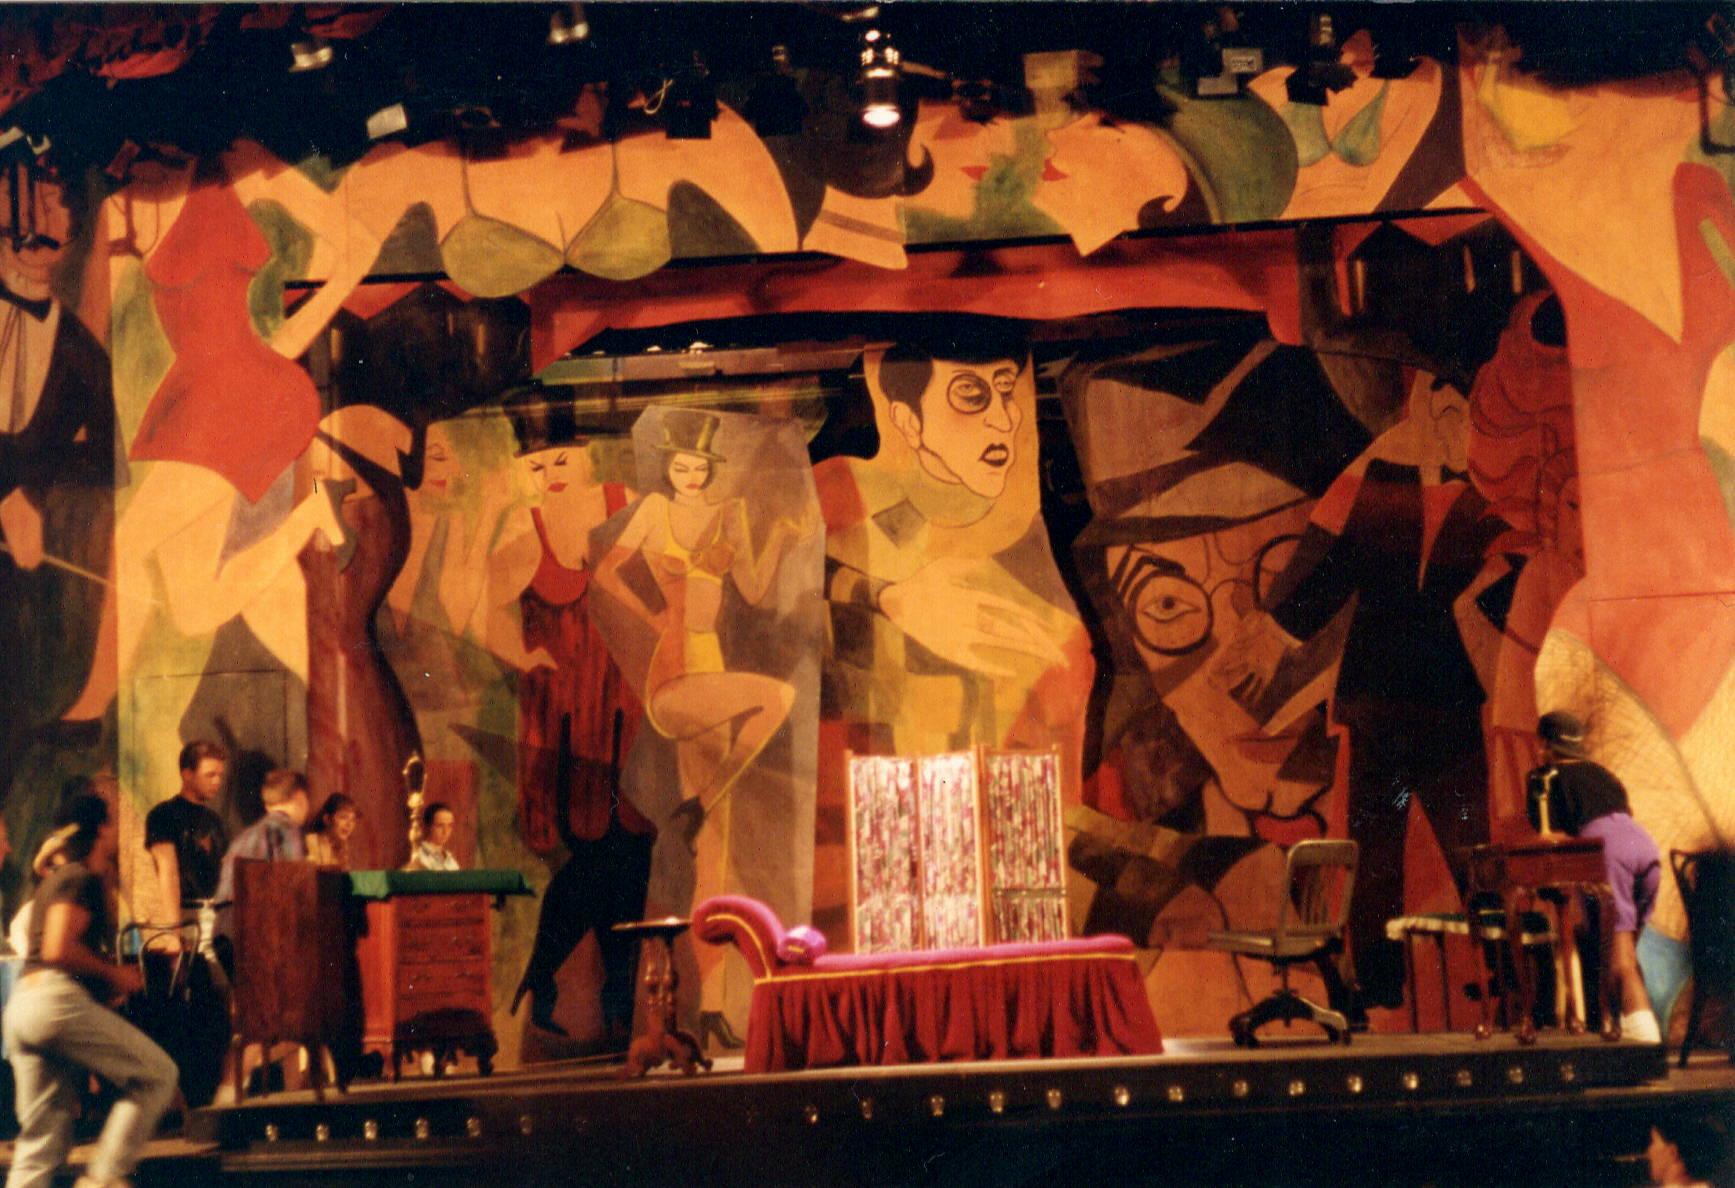 Cabaret at the The Little Theater on the Square, Sullivan, Illinois